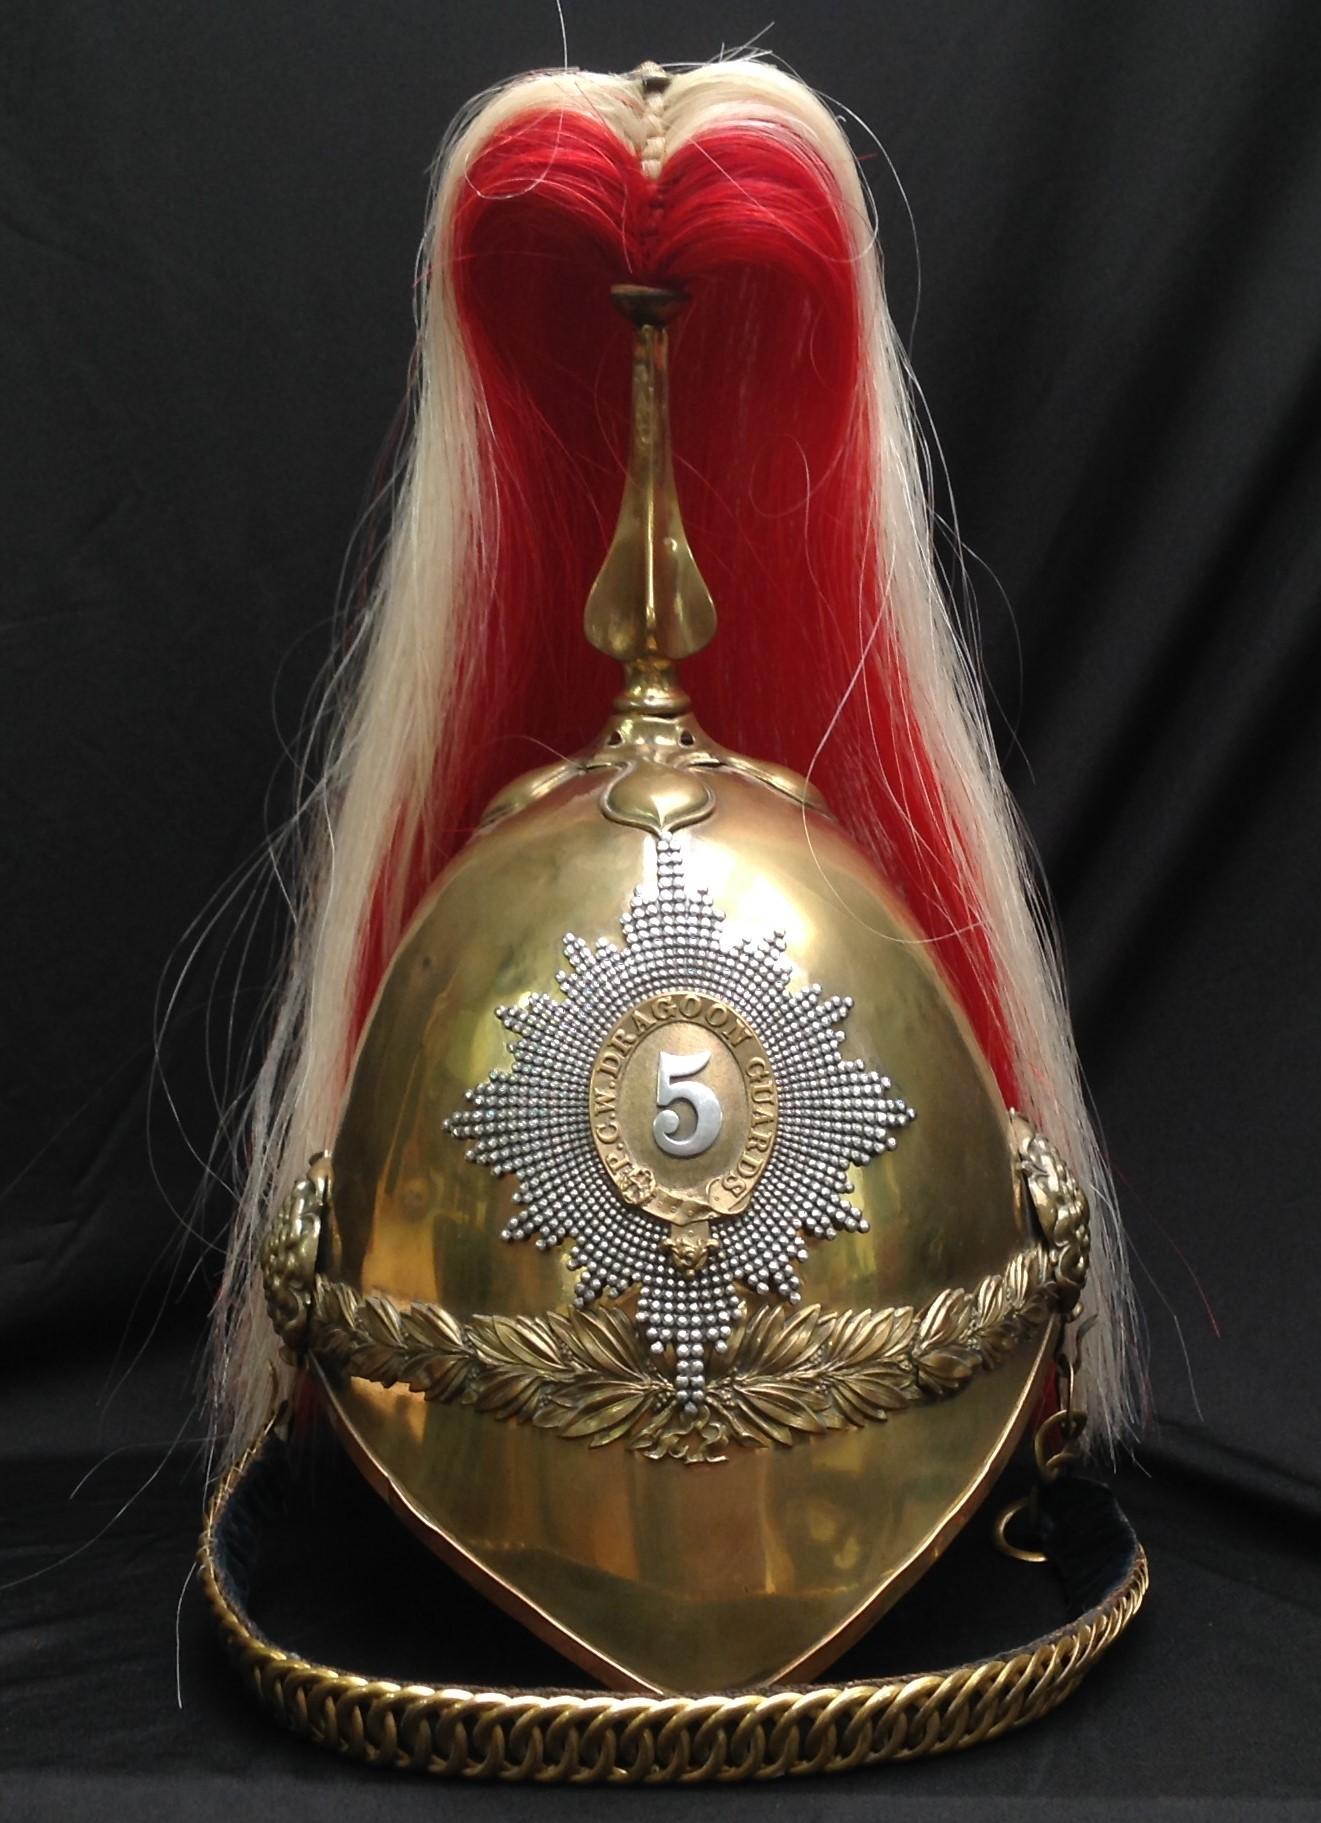 British Victorian 1871 Pattern Cavalry Helmet. Brass skull with 5th Princess Charlotte of Wales